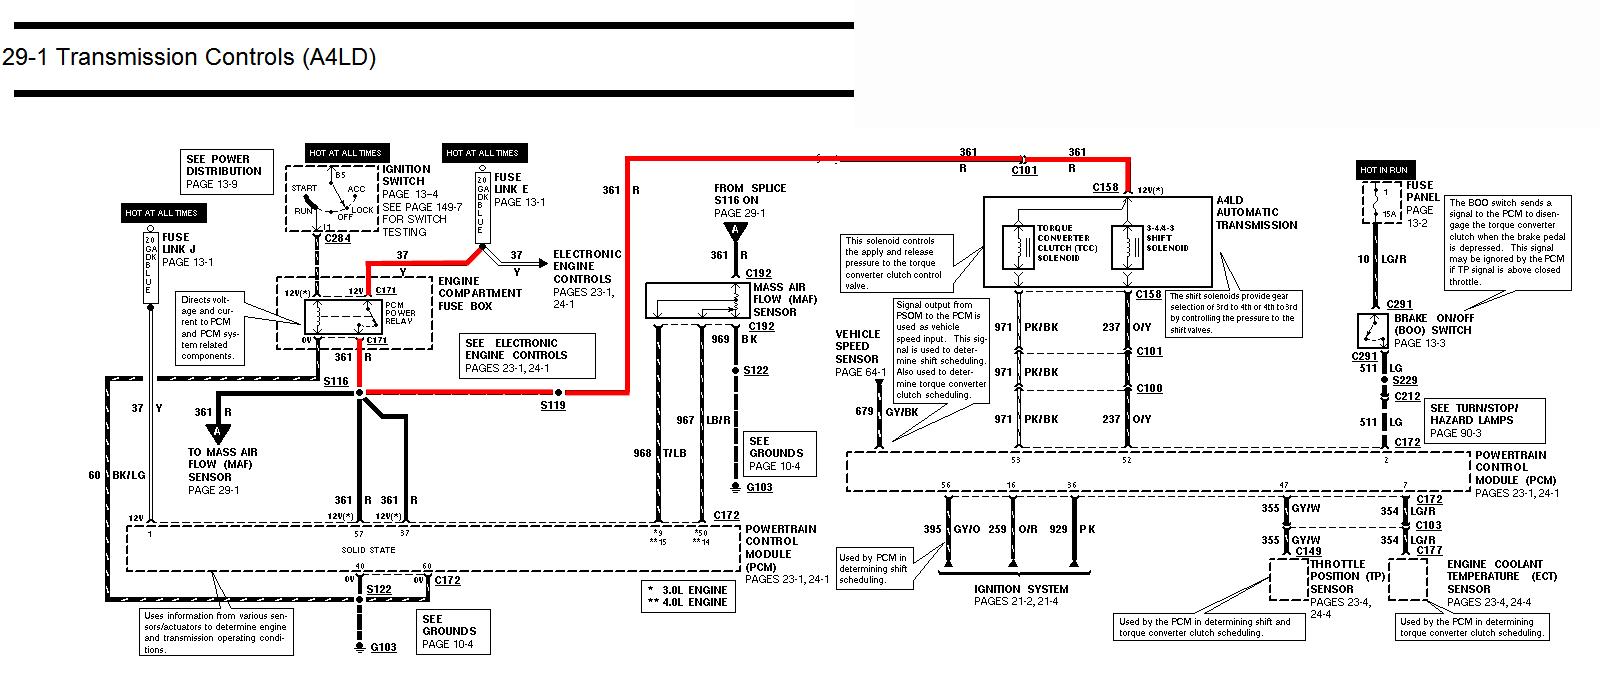 97 F150 Transmission Diagram